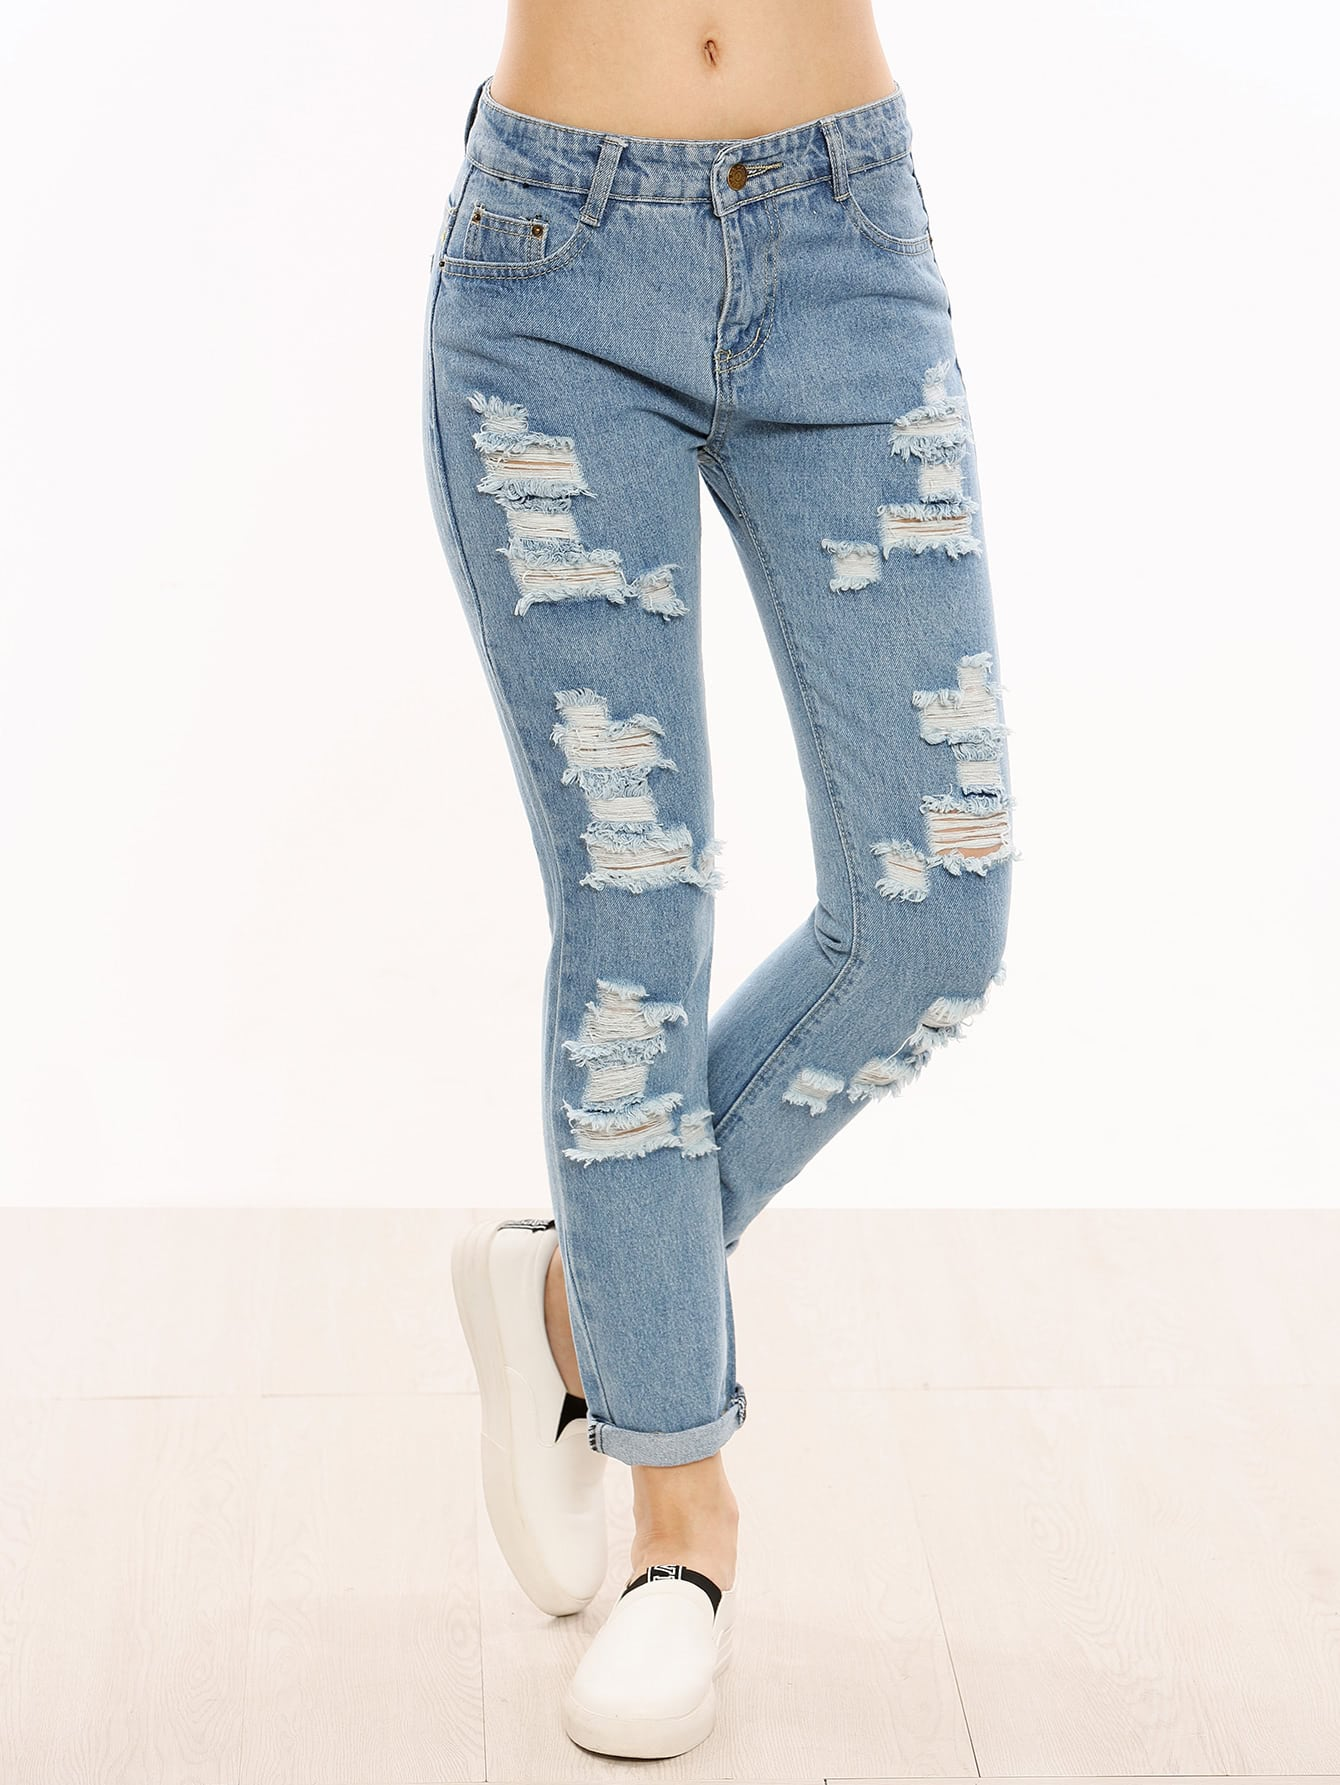 Фото синие джинсы доставка